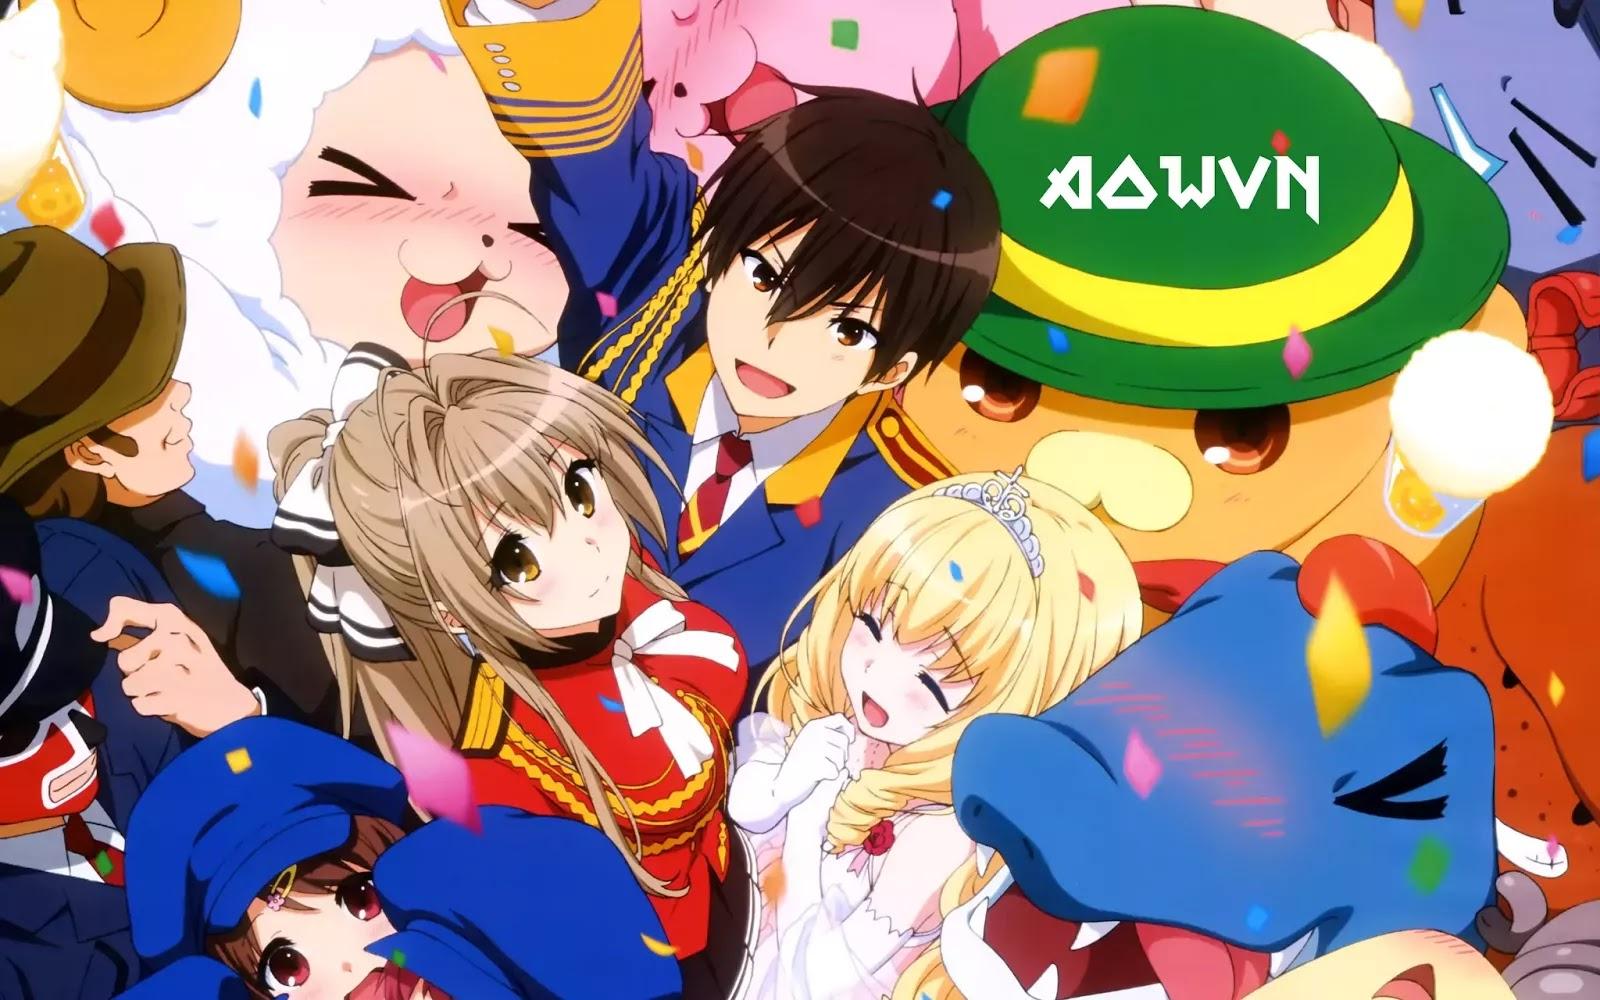 AowVN - [ Anime 3gp ] Amagi Brilliant Park BD + Special | Vietsub – Công Viên Rực Rỡ